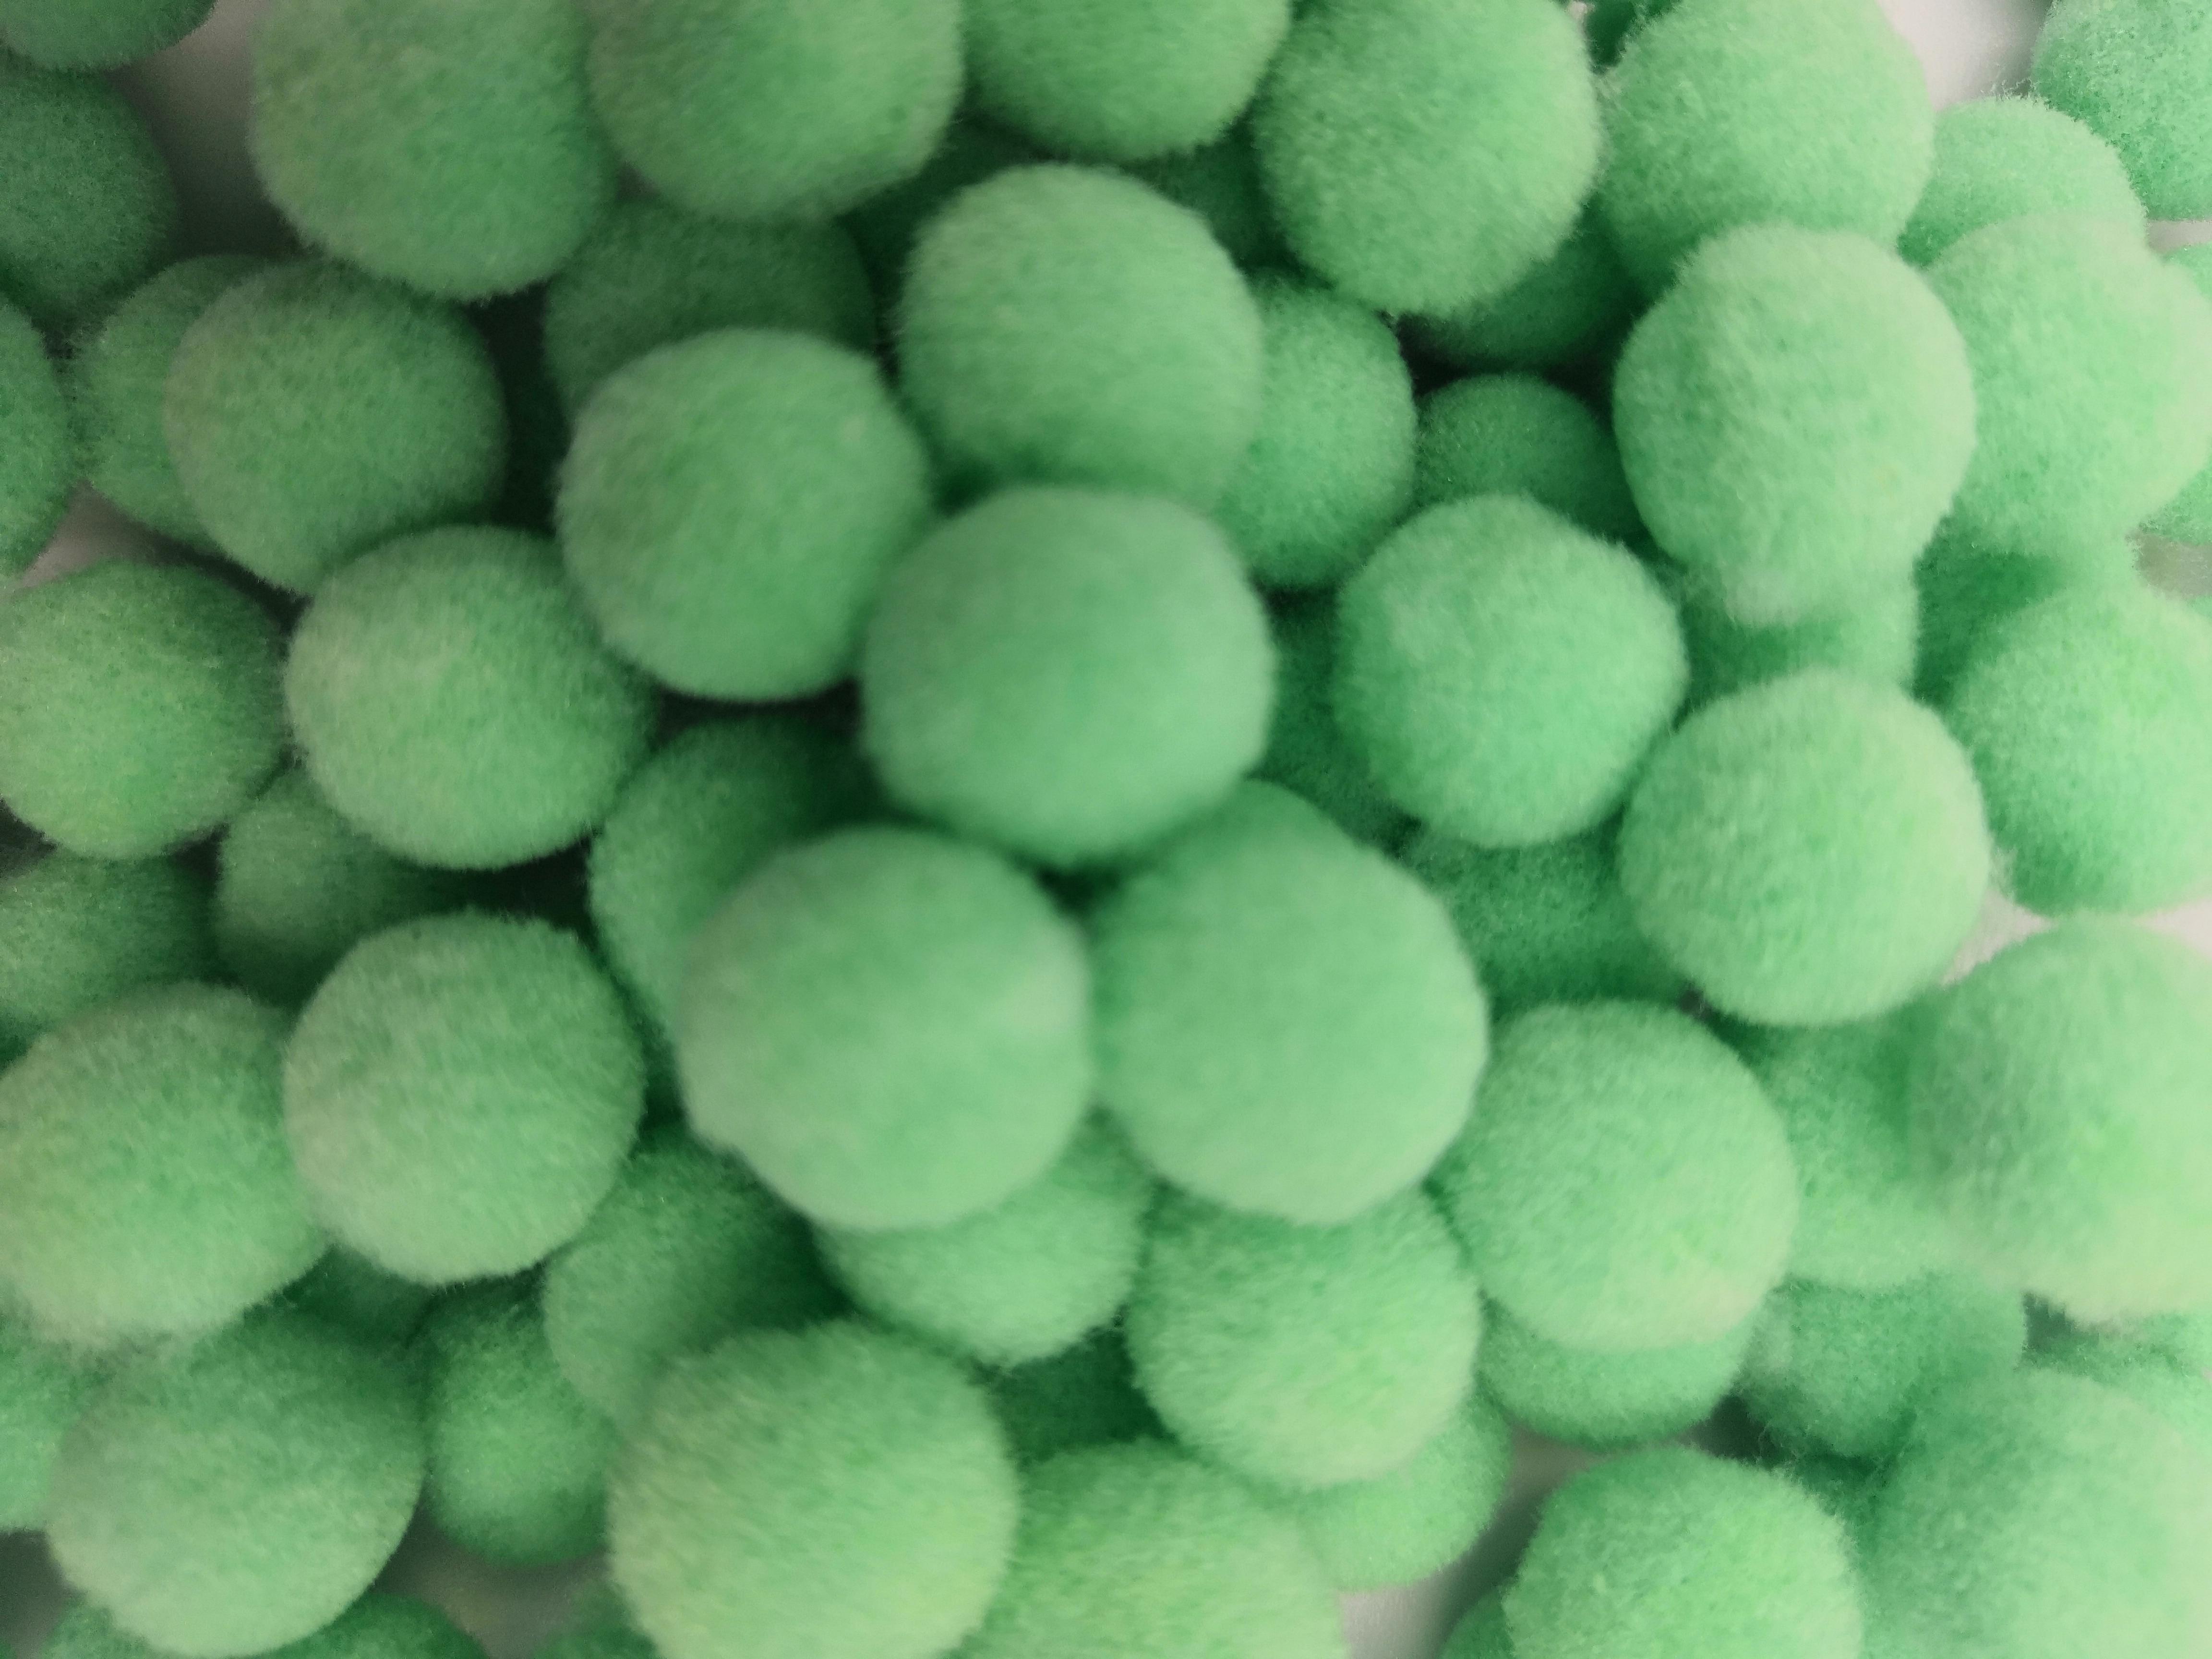 100Pcs bag 10 15 20 25mm Mini Fluffy Soft Pom Poms Pompoms Ball Handmade Kids Toys Wedding Decor DIY Sewing Craft Supplies in DIY Craft Supplies from Home Garden